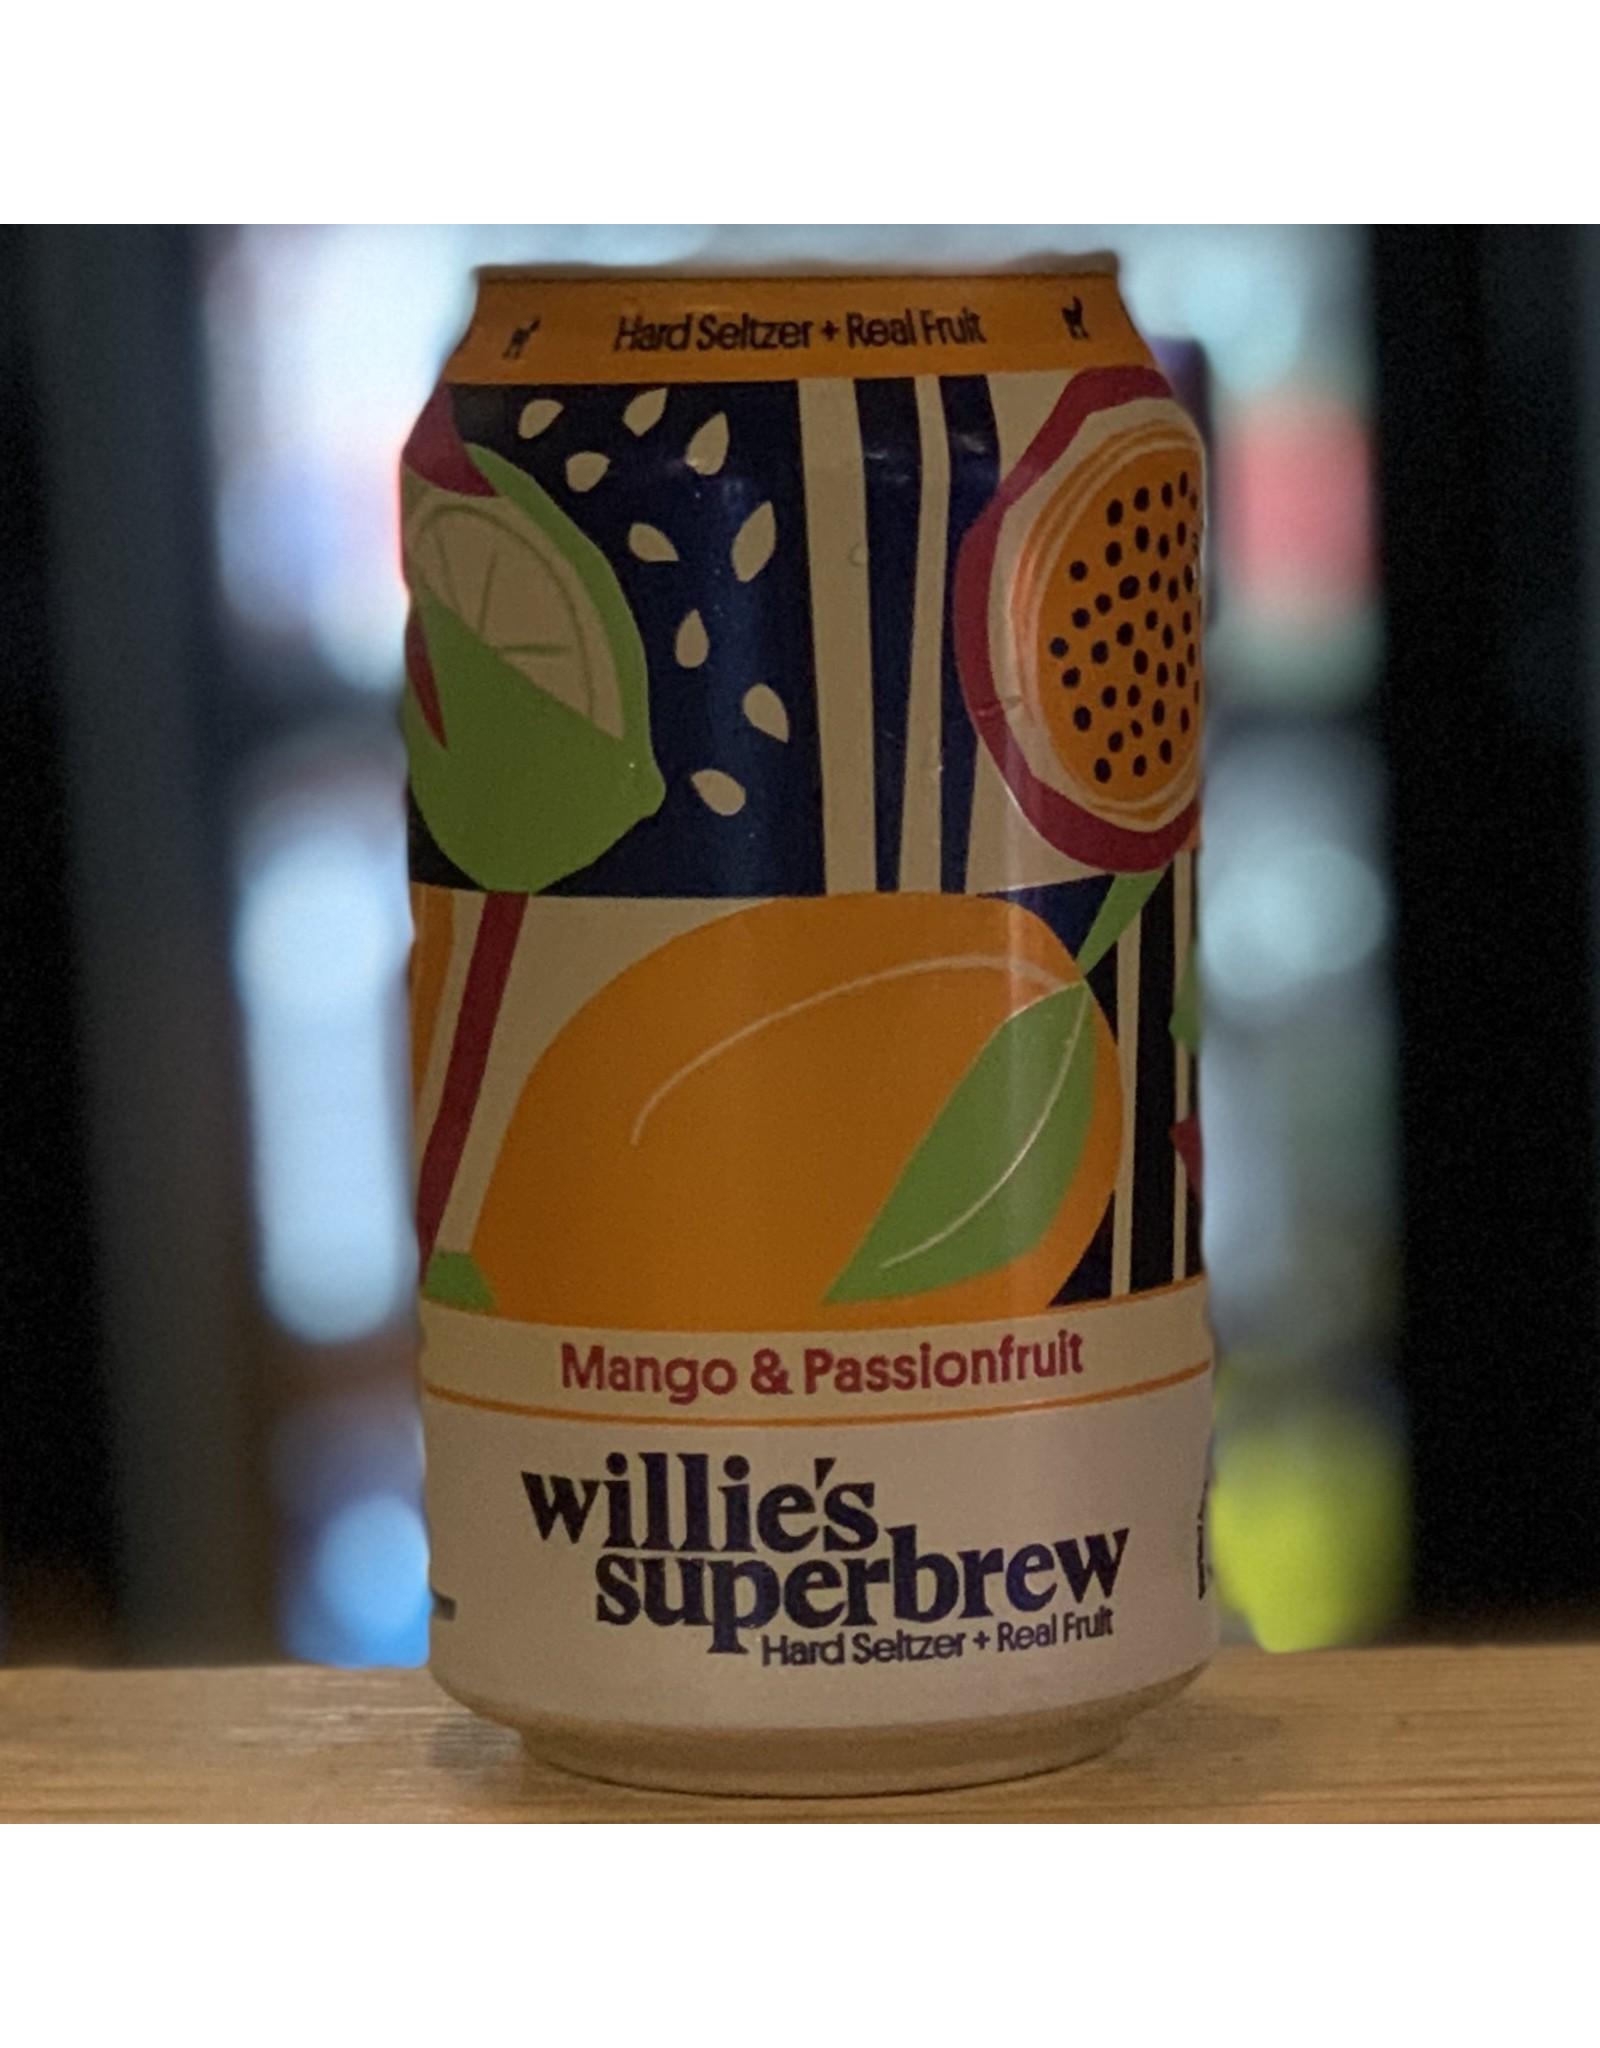 Hard Seltzer Willie's Superbrew Hard Seltzer w/Mango & Passionfruit